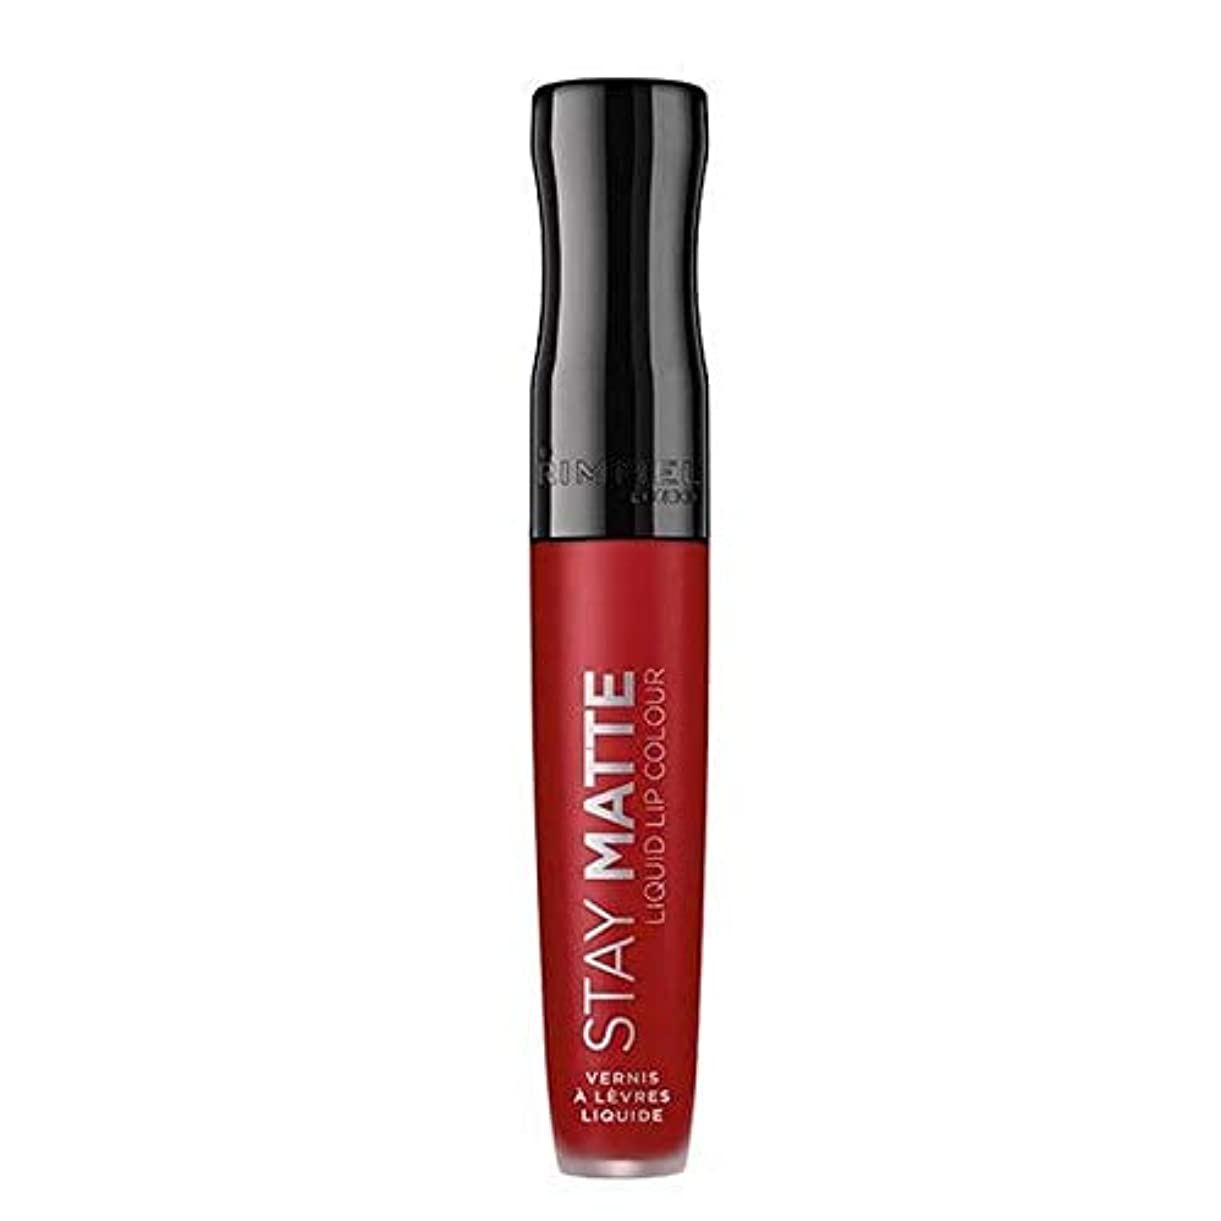 [Rimmel ] リンメルステイマット液状口紅火災スターター500 - Rimmel Stay Matte Liquid Lipstick Fire Starter 500 [並行輸入品]